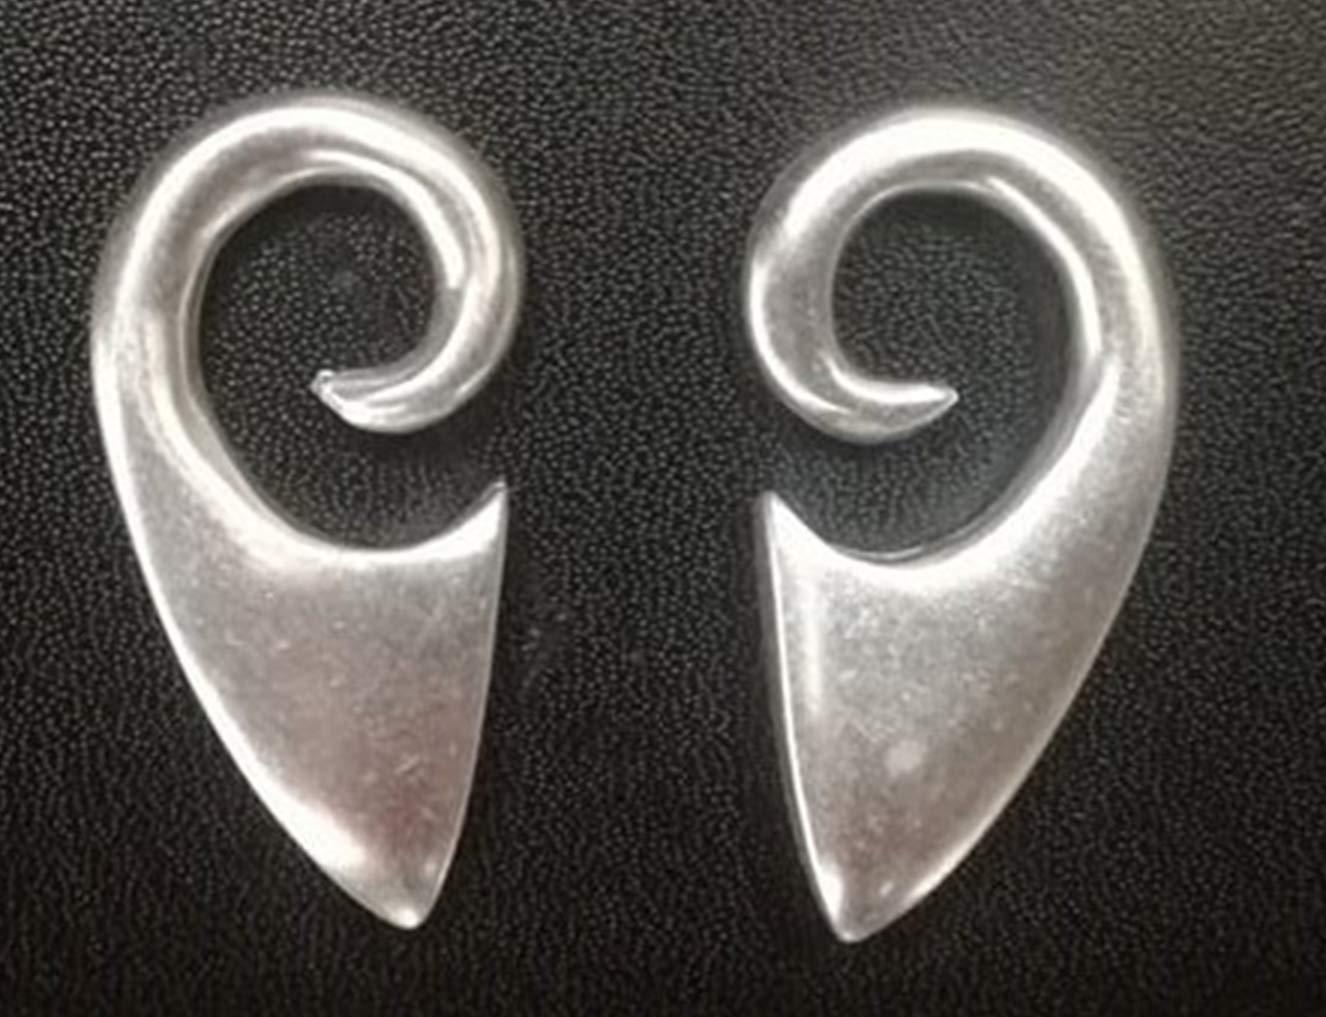 Pesos de oreja de pareja plateados plata para lóbulos estirados - Dos pendientes dilataciones orejas - Earrings Plugs CELTIC - Modelo original único hecho a ...